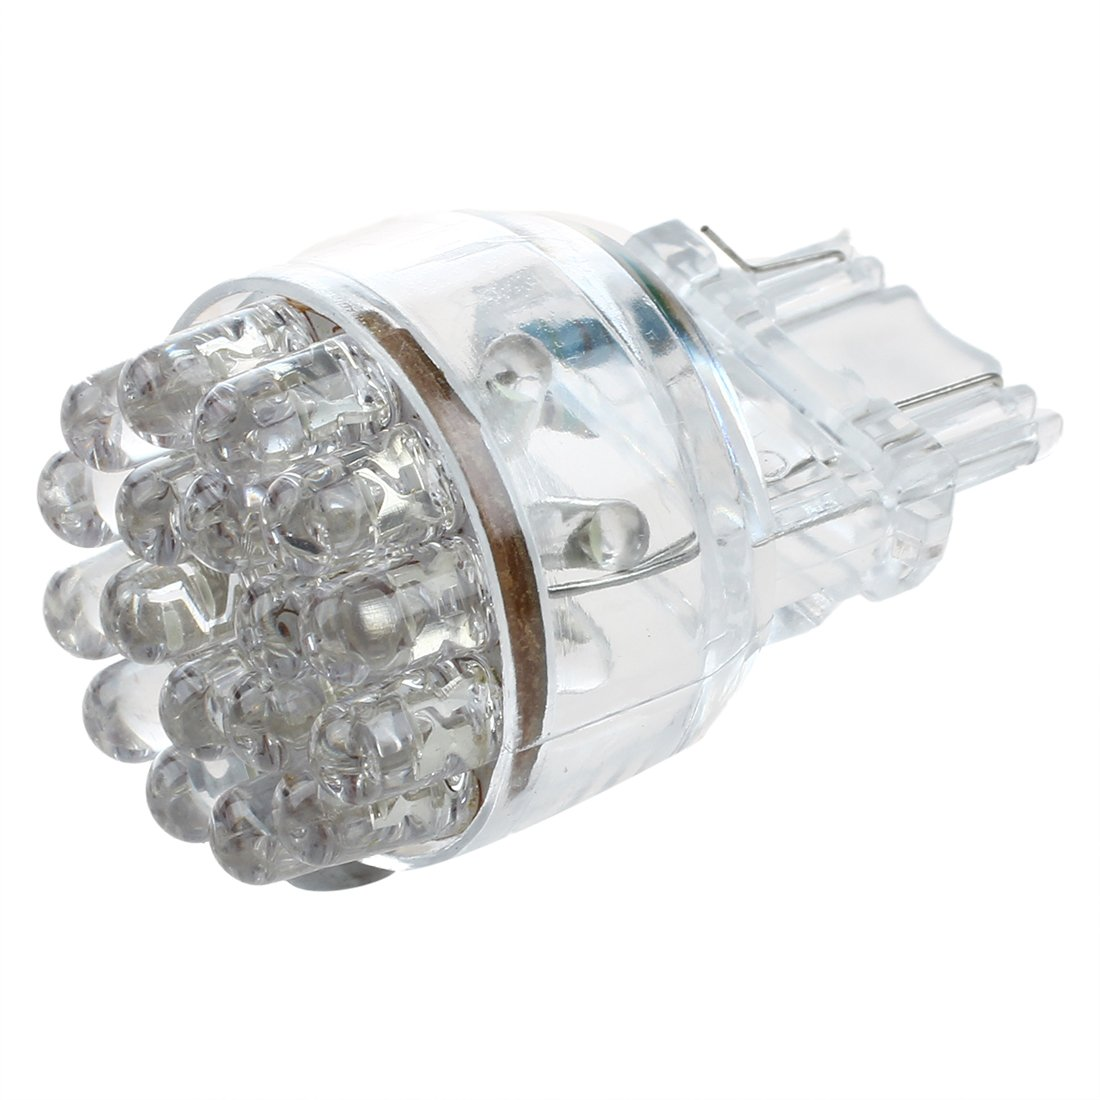 TOOGOO(R)T25 24 3157 3057 LED Car Brake Stop Turn Signal Light Bulb 1.5W Wedge White Super Bright